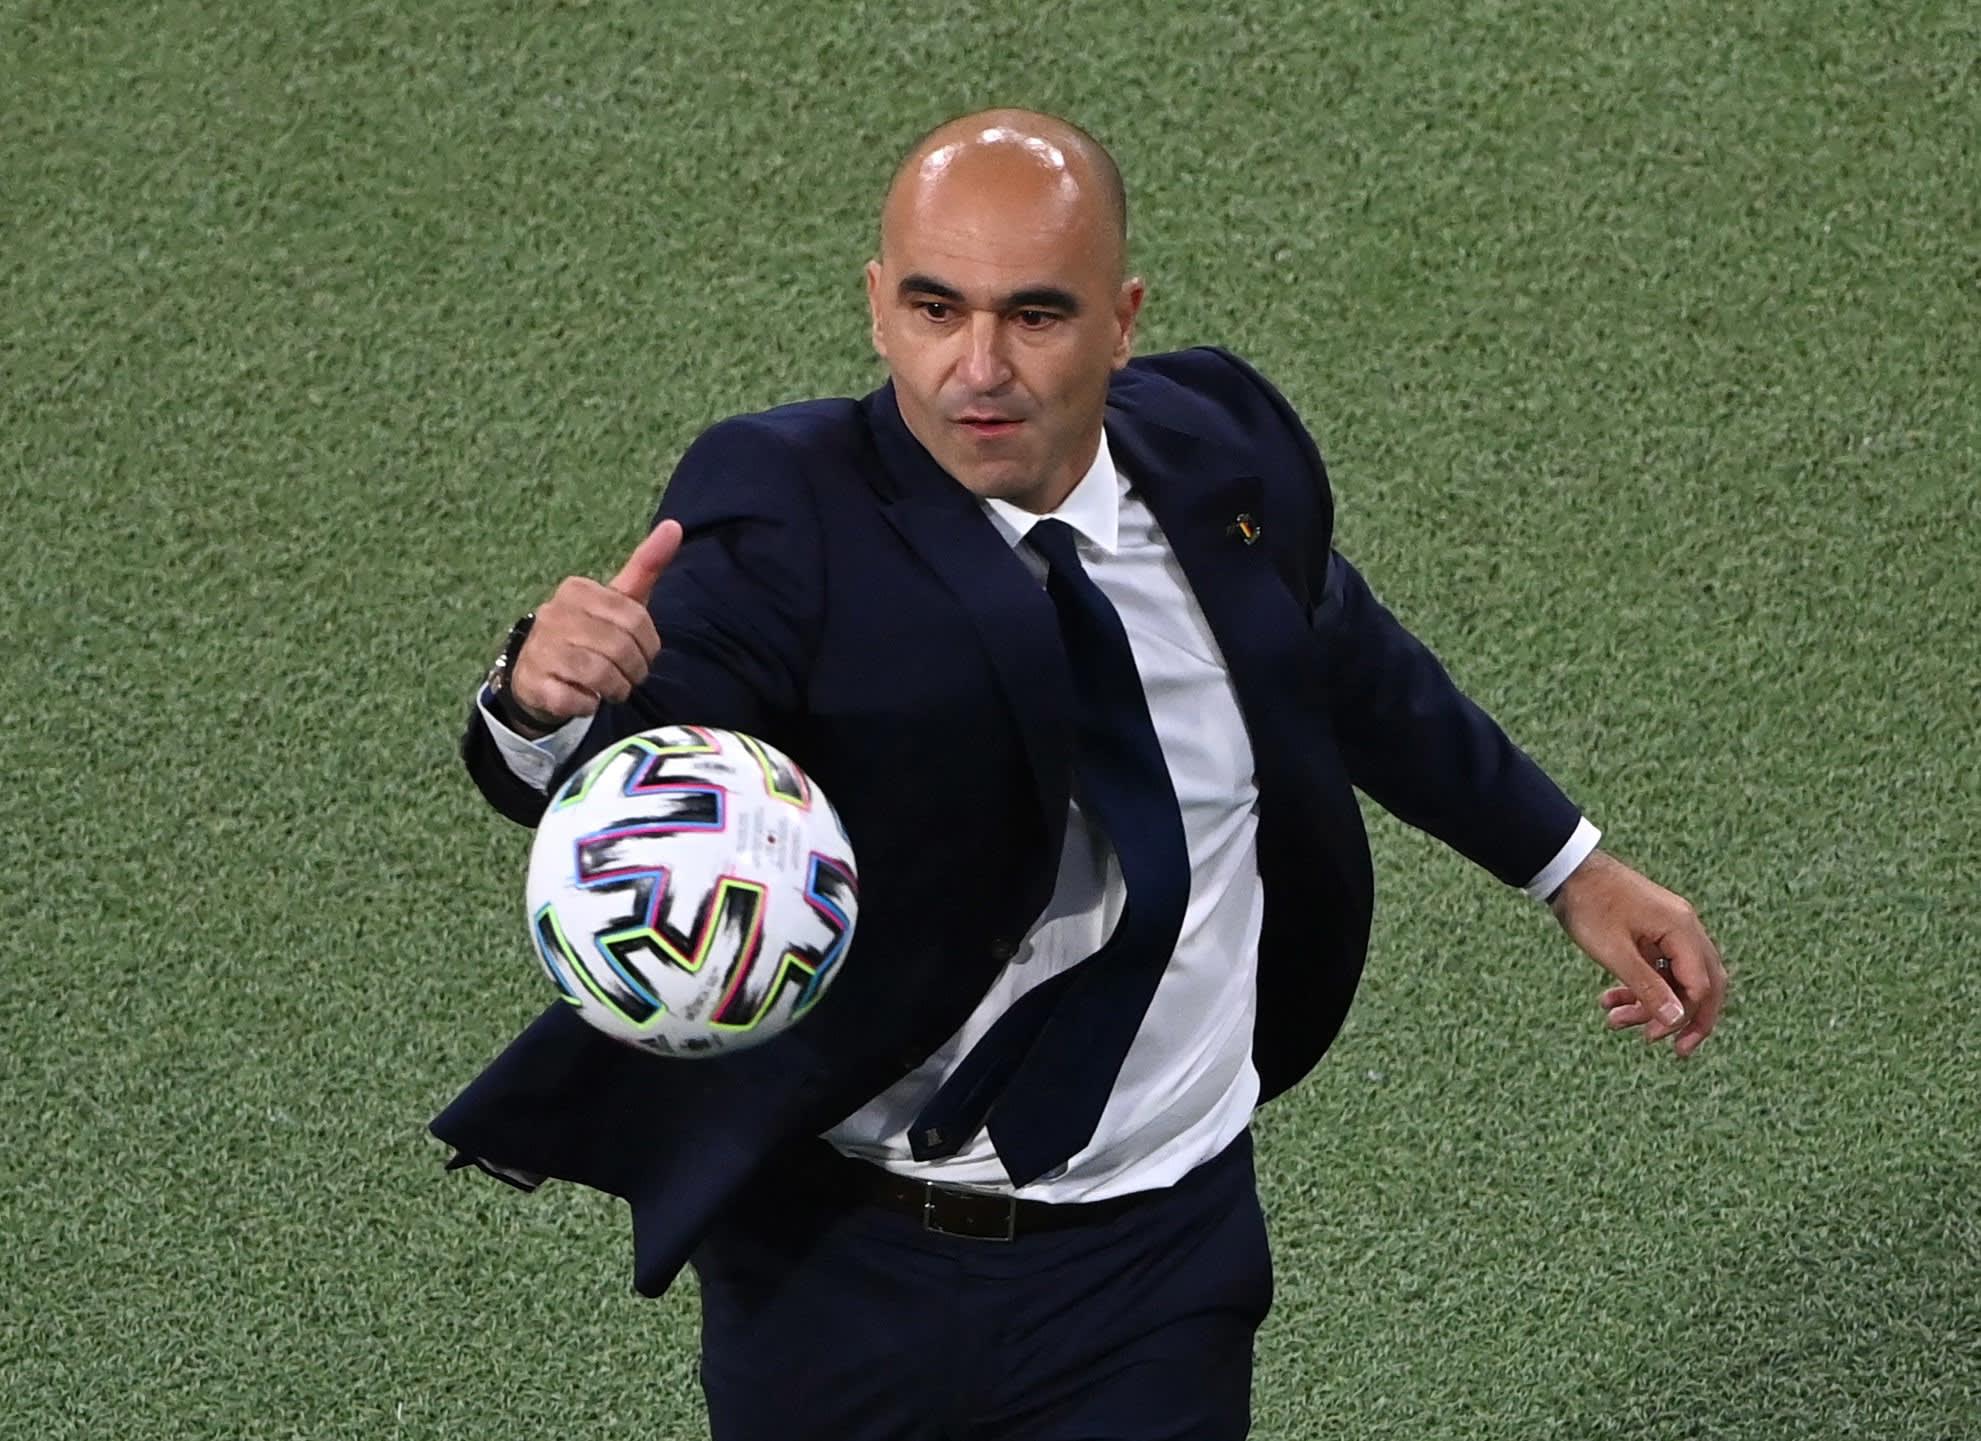 Roberto Martinez coaches Belgium national team